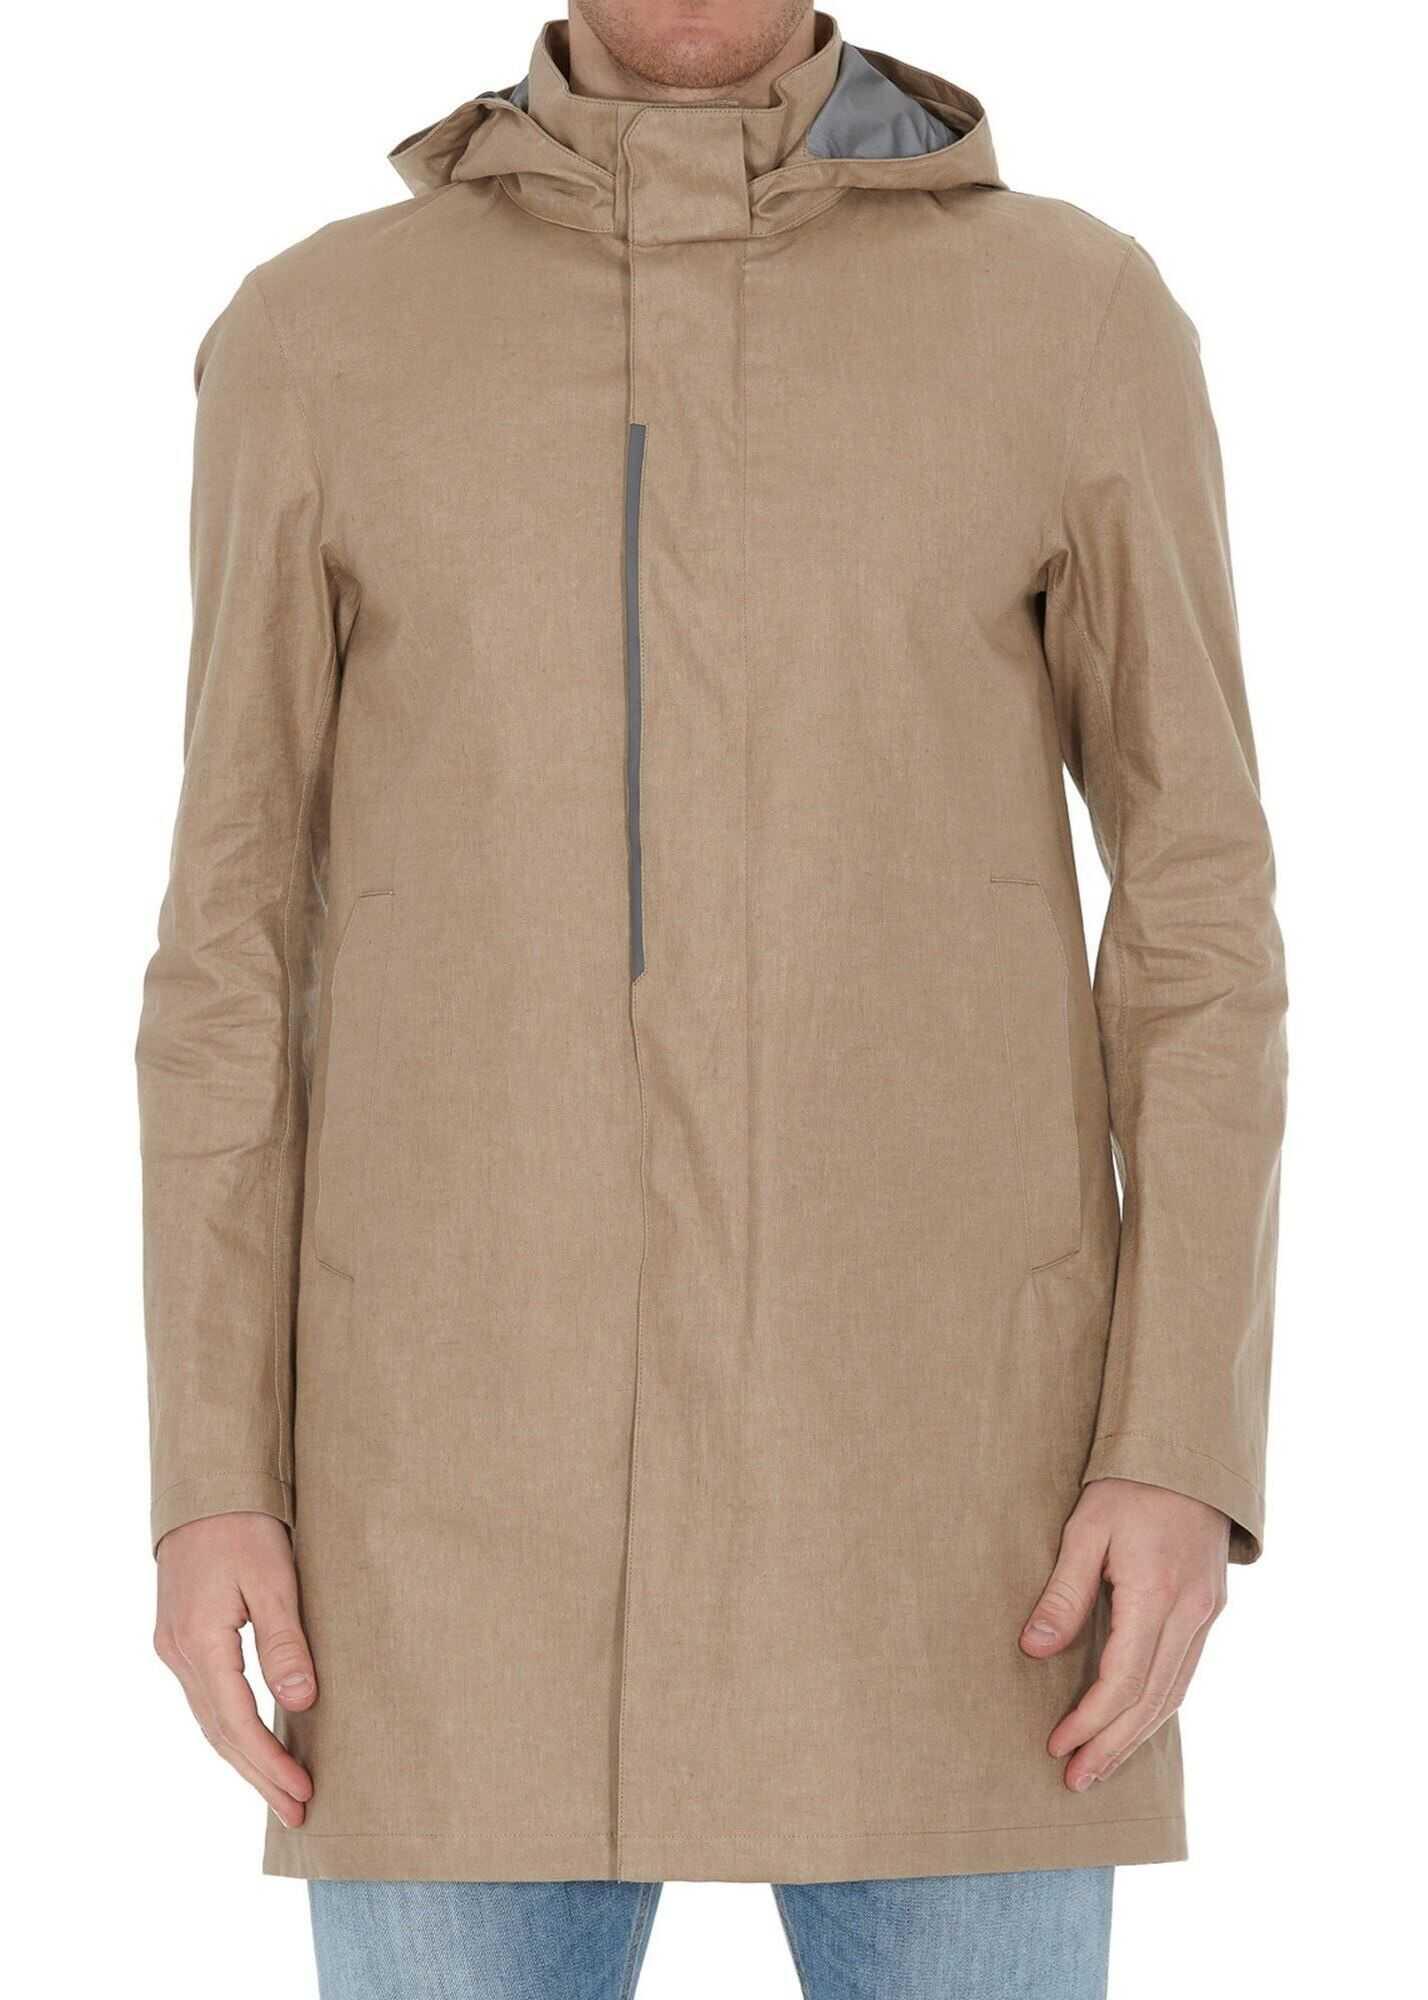 Herno Laminar Raincoat In Beige Beige imagine